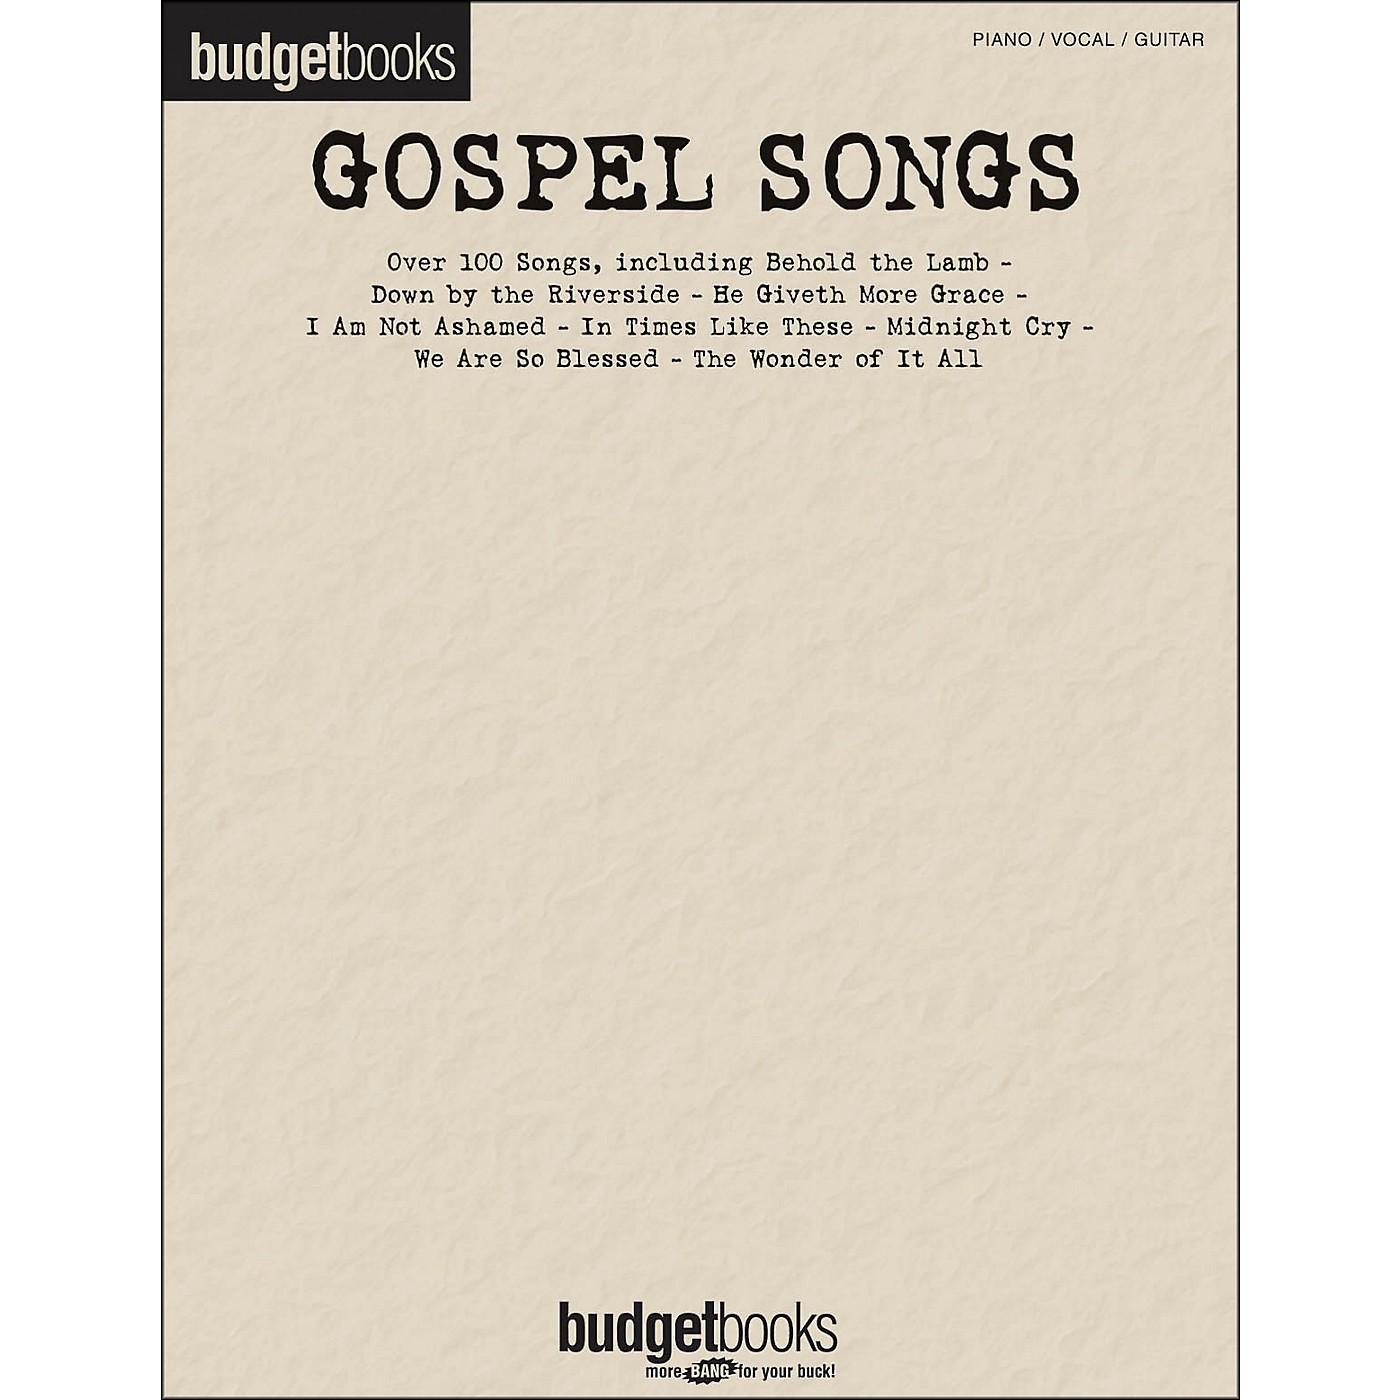 Hal Leonard Gospel Songs - Budget Books arranged for piano, vocal, and guitar (P/V/G) thumbnail